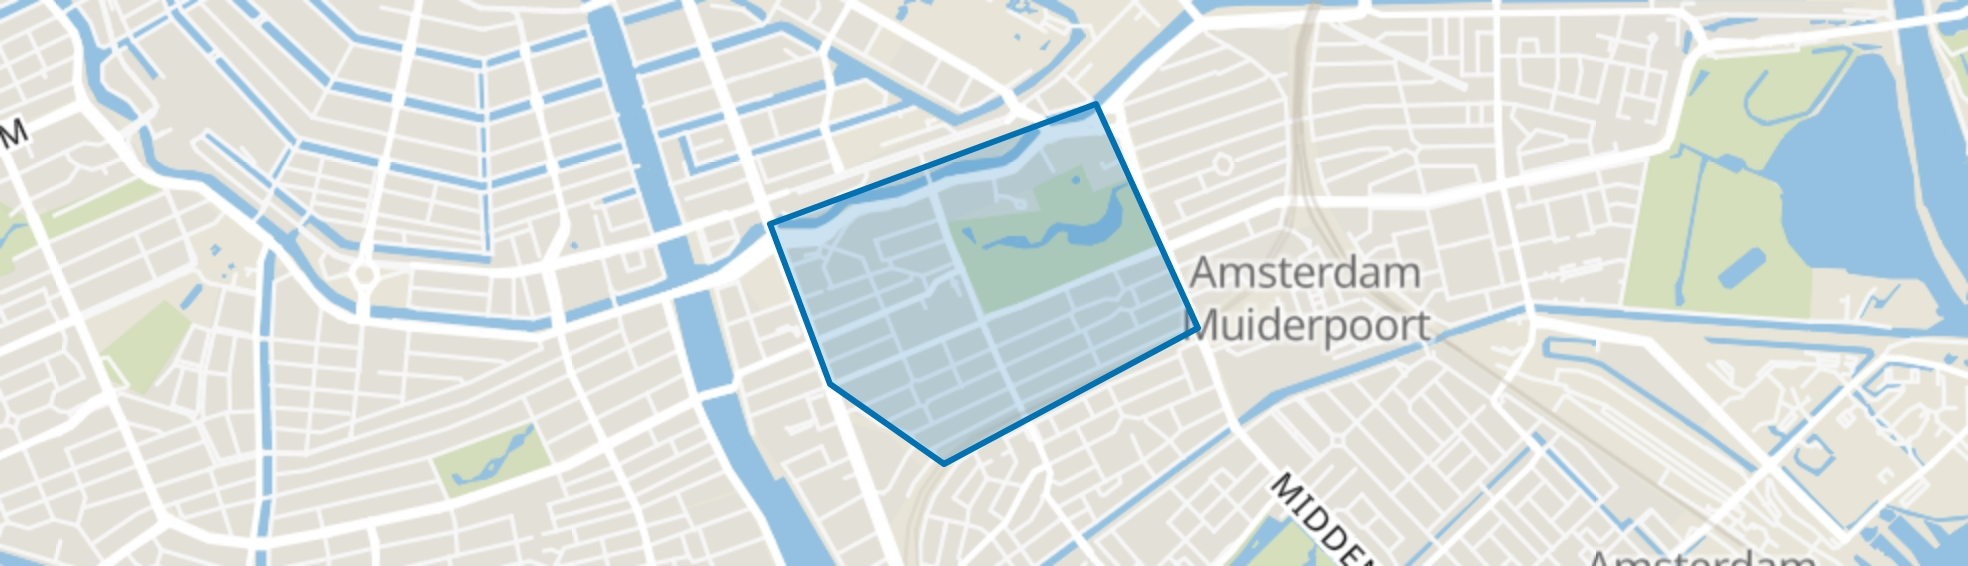 Oosterparkbuurt, Amsterdam map